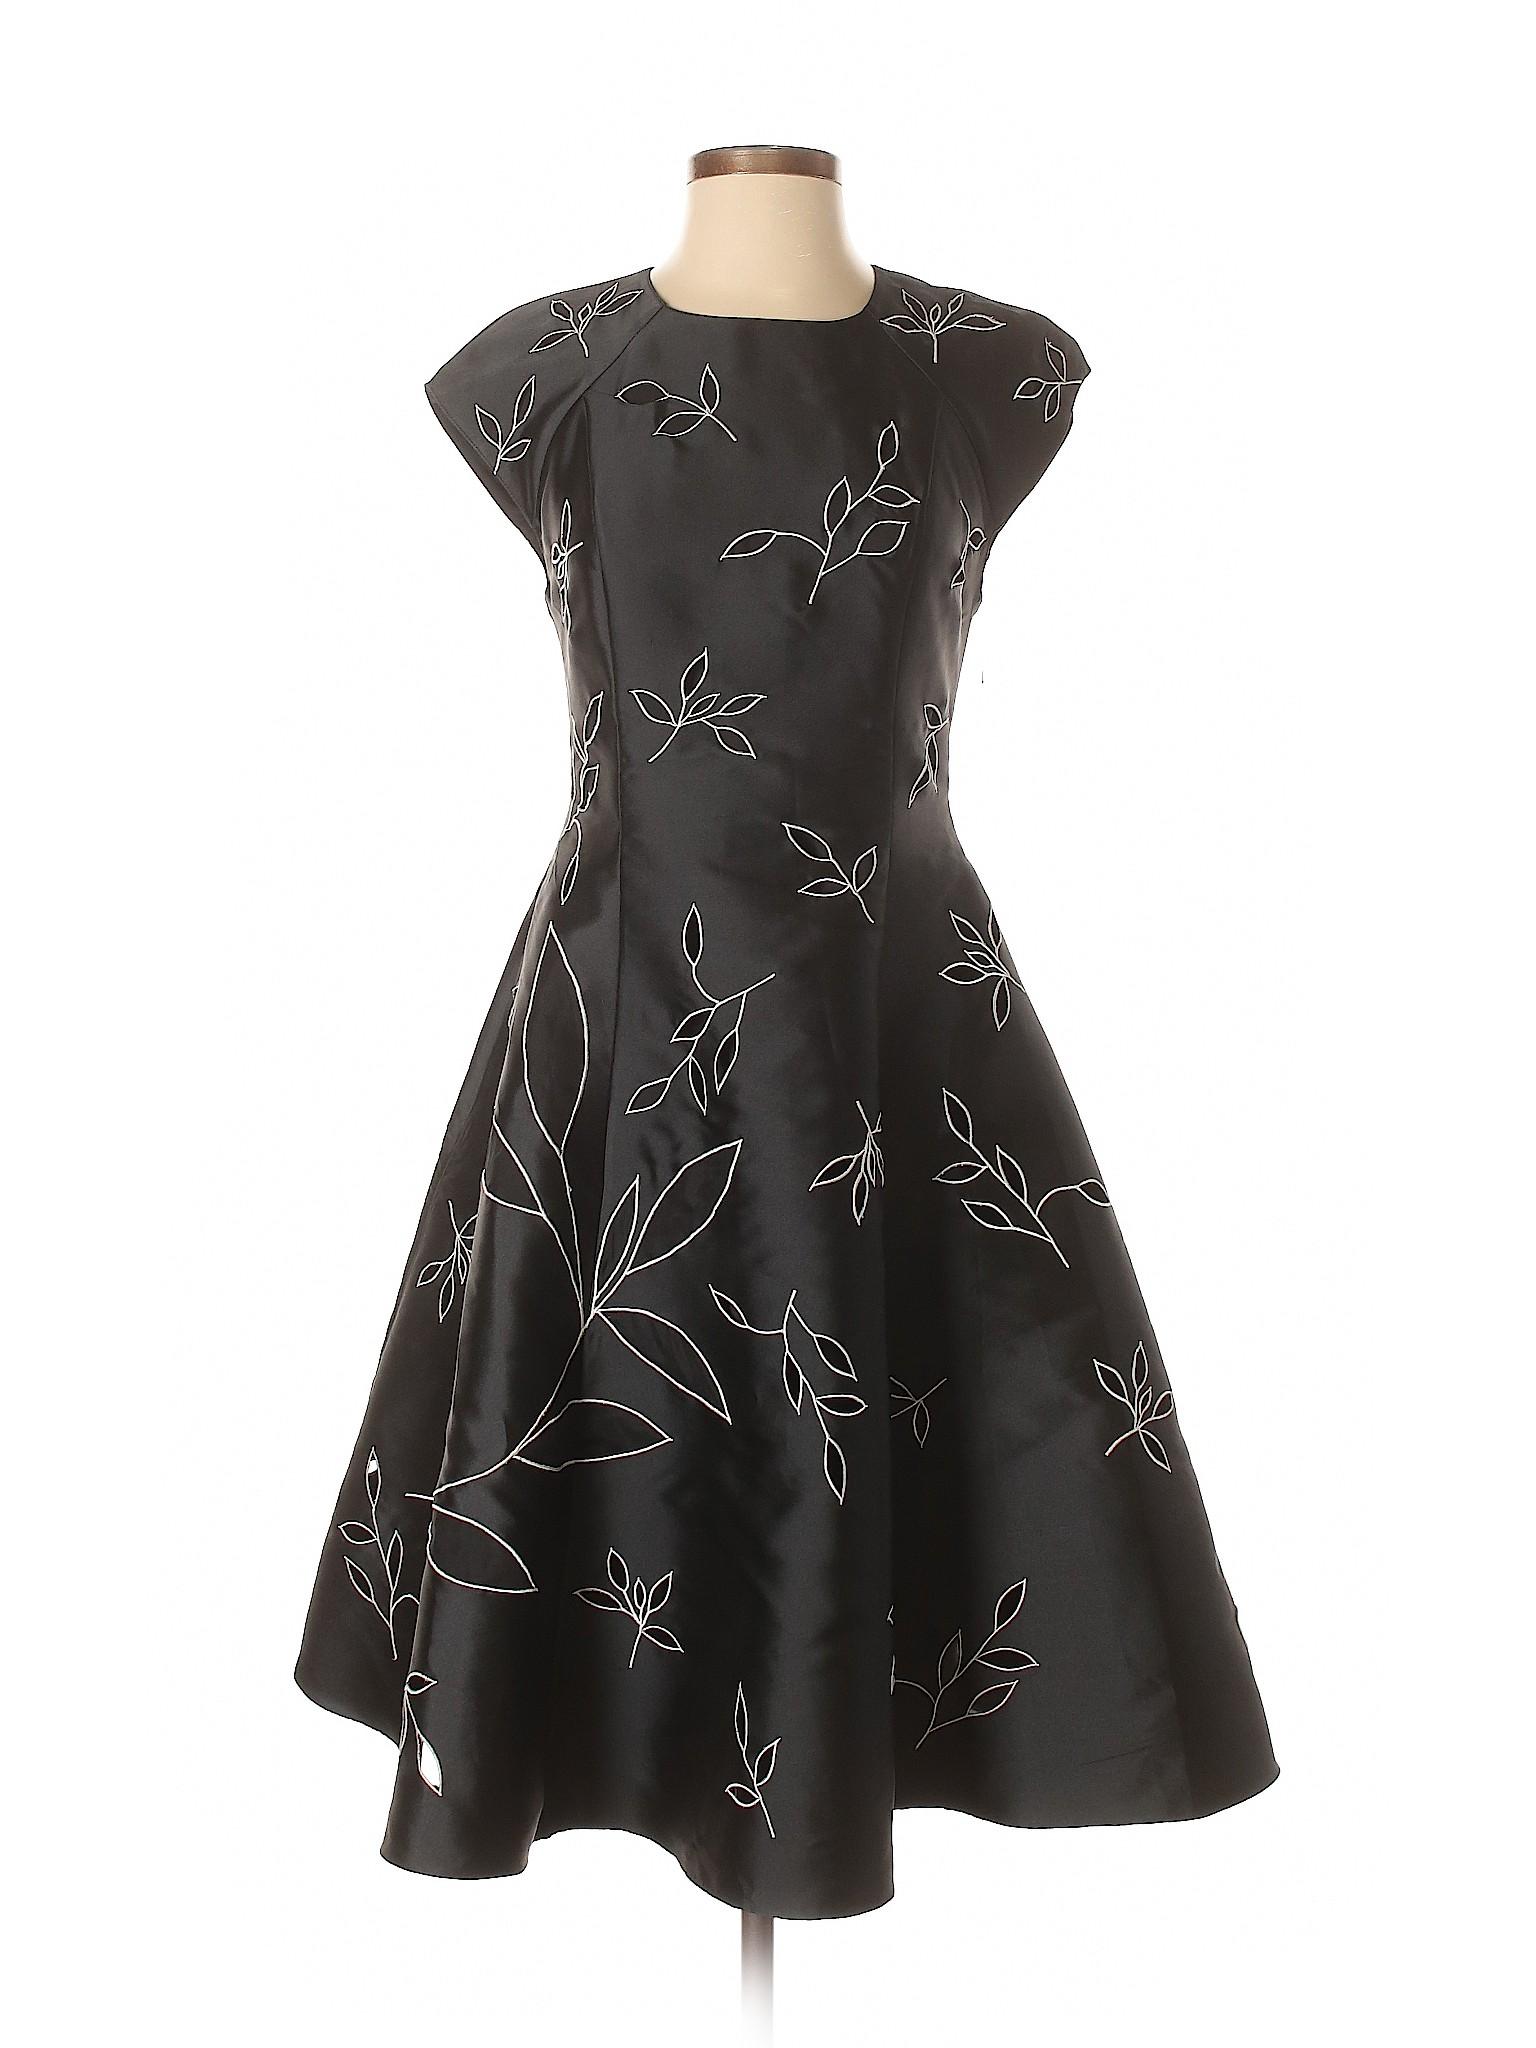 Babi Sachin winter Casual Boutique NOIR Dress 7WanS00qxB